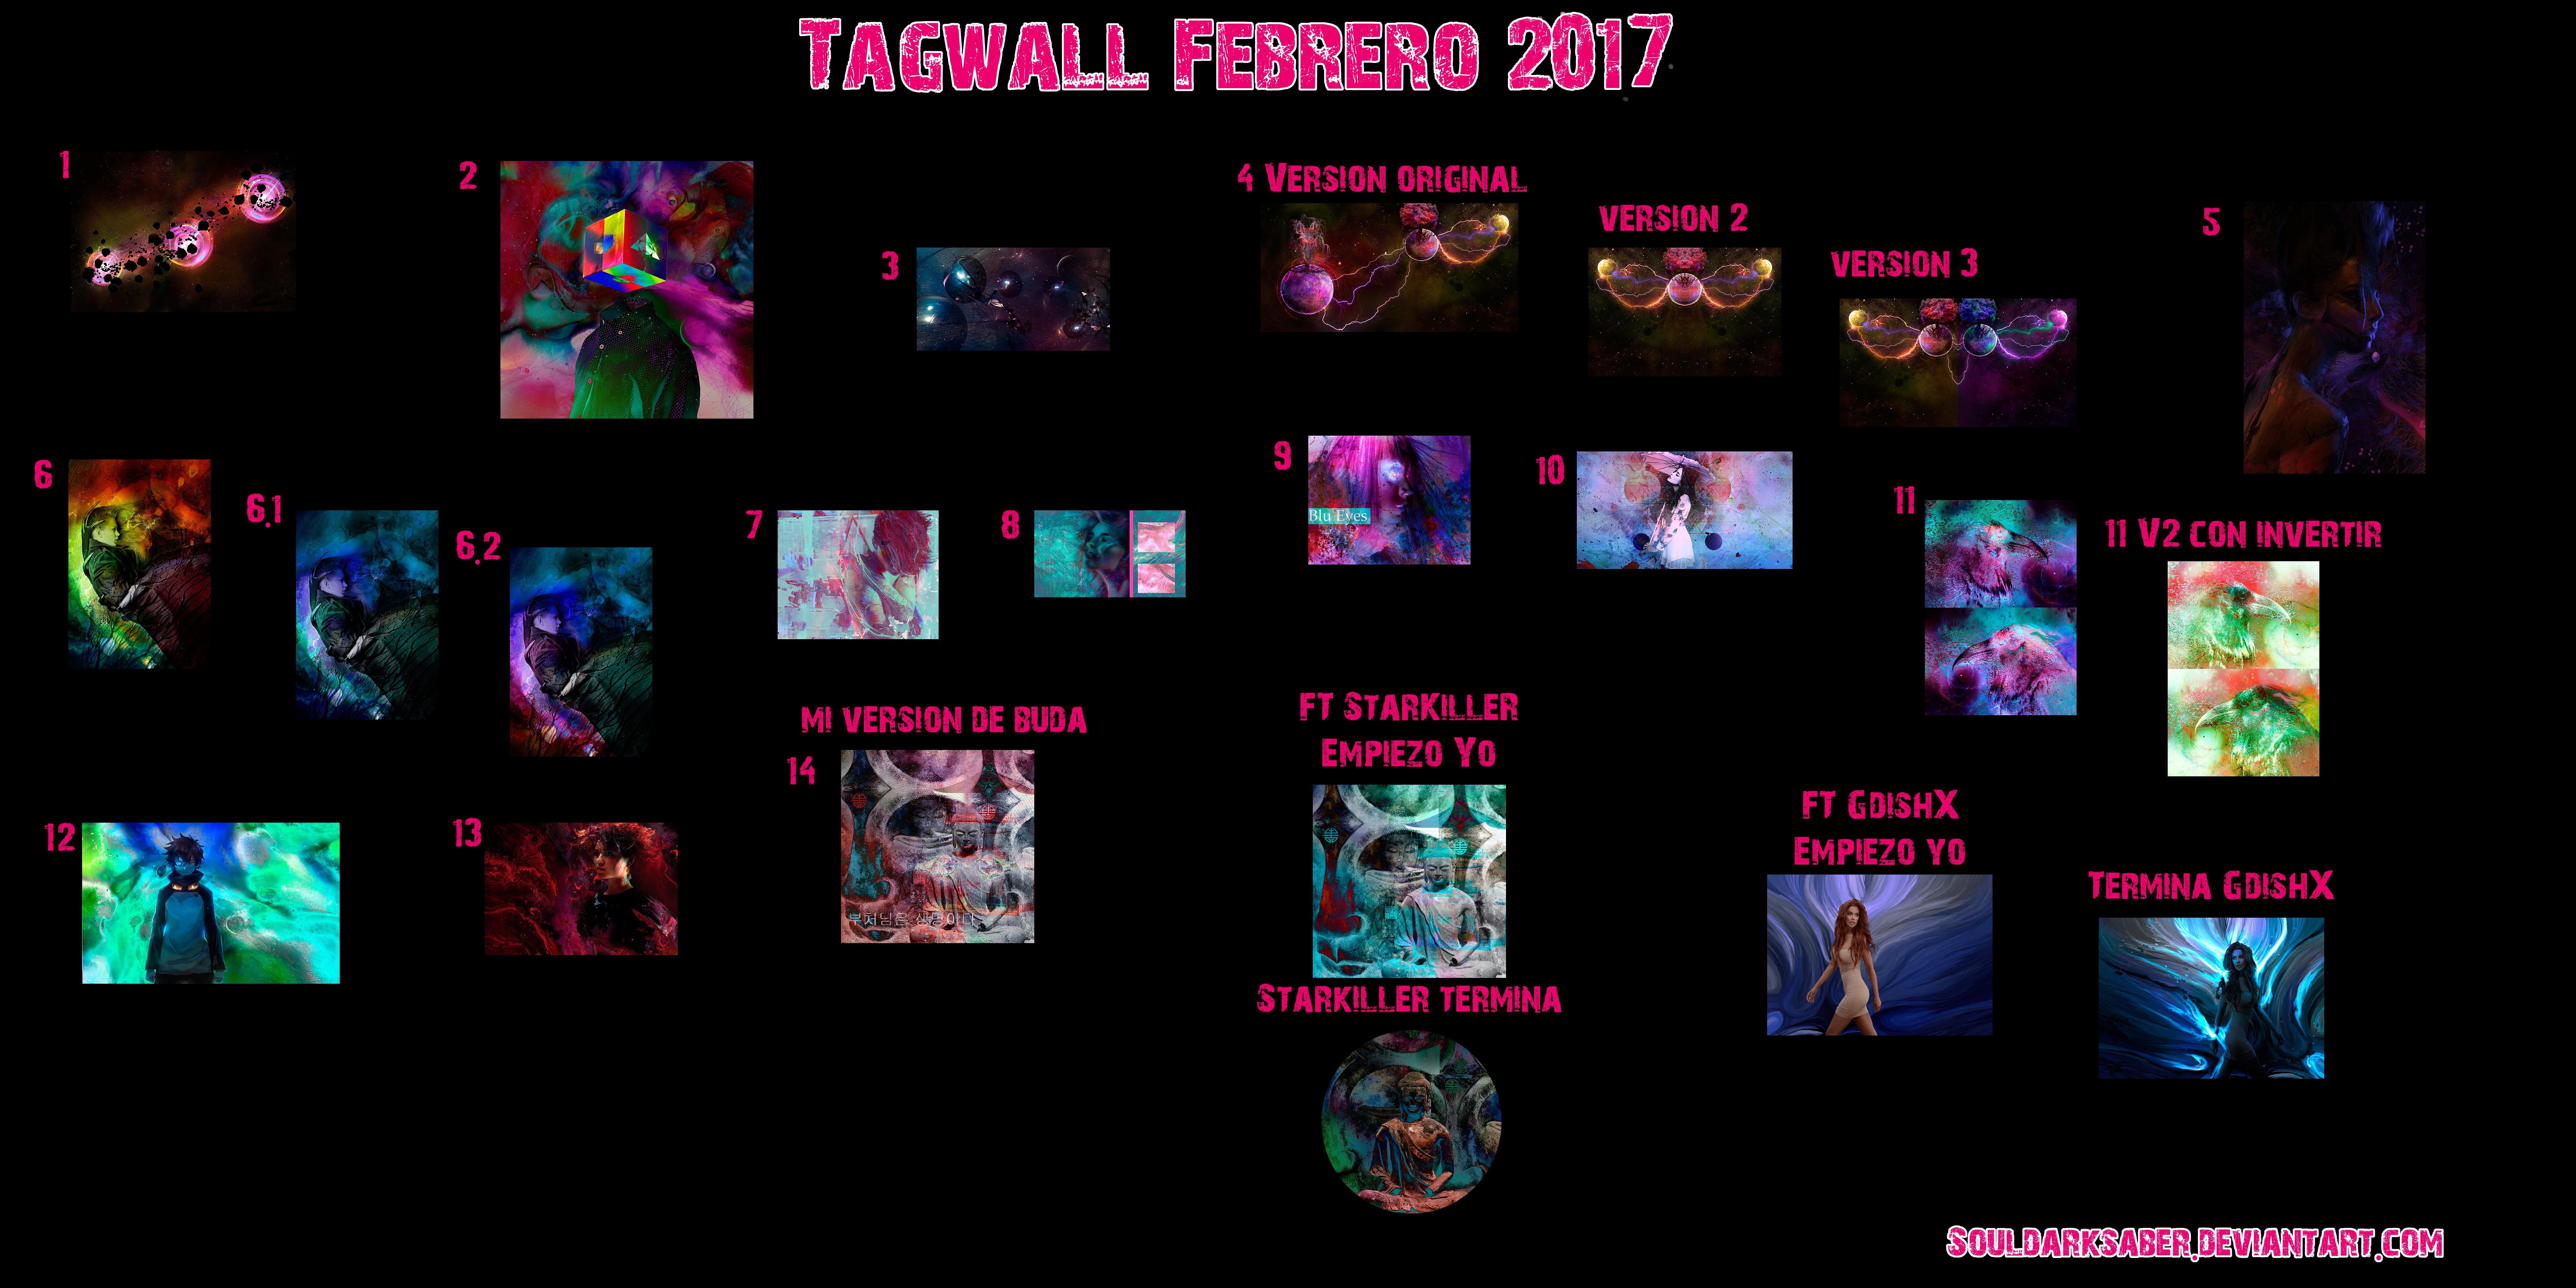 Febrero 2017 Tagwall_febrero_2017_by_souldarksaber-db0vhem